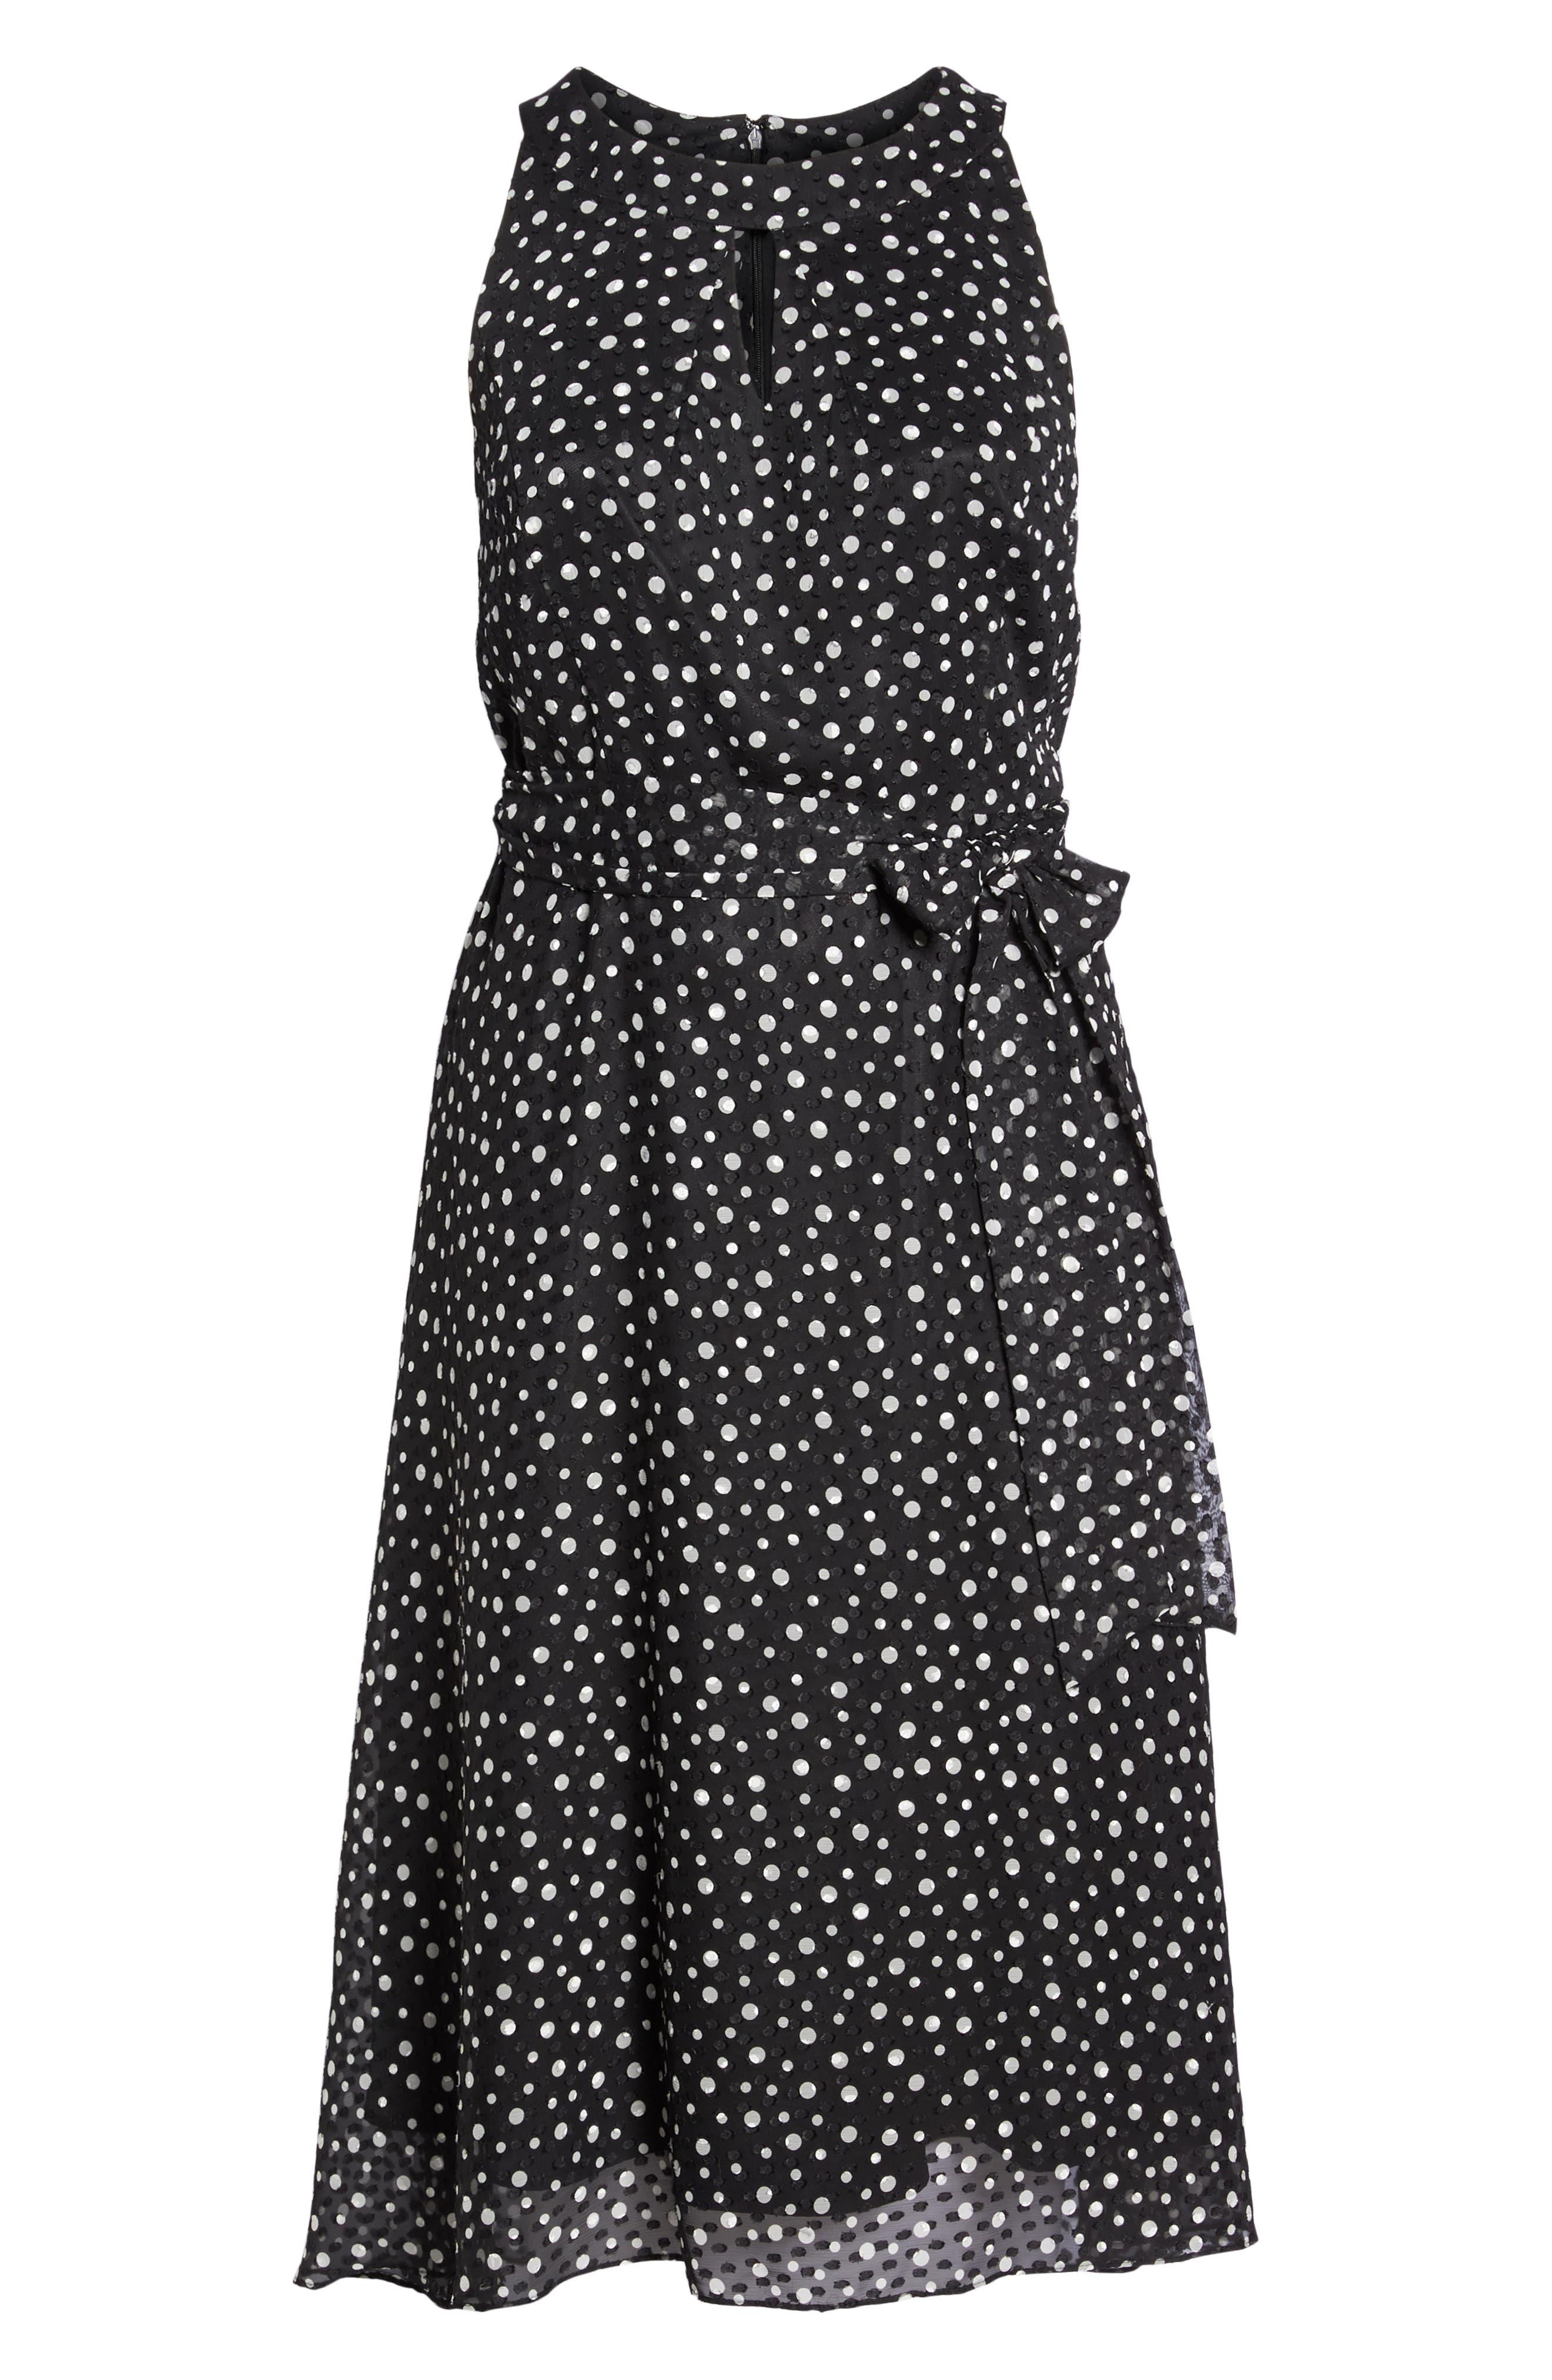 Polka Dot Keyhole Chiffon Dress,                             Alternate thumbnail 7, color,                             003